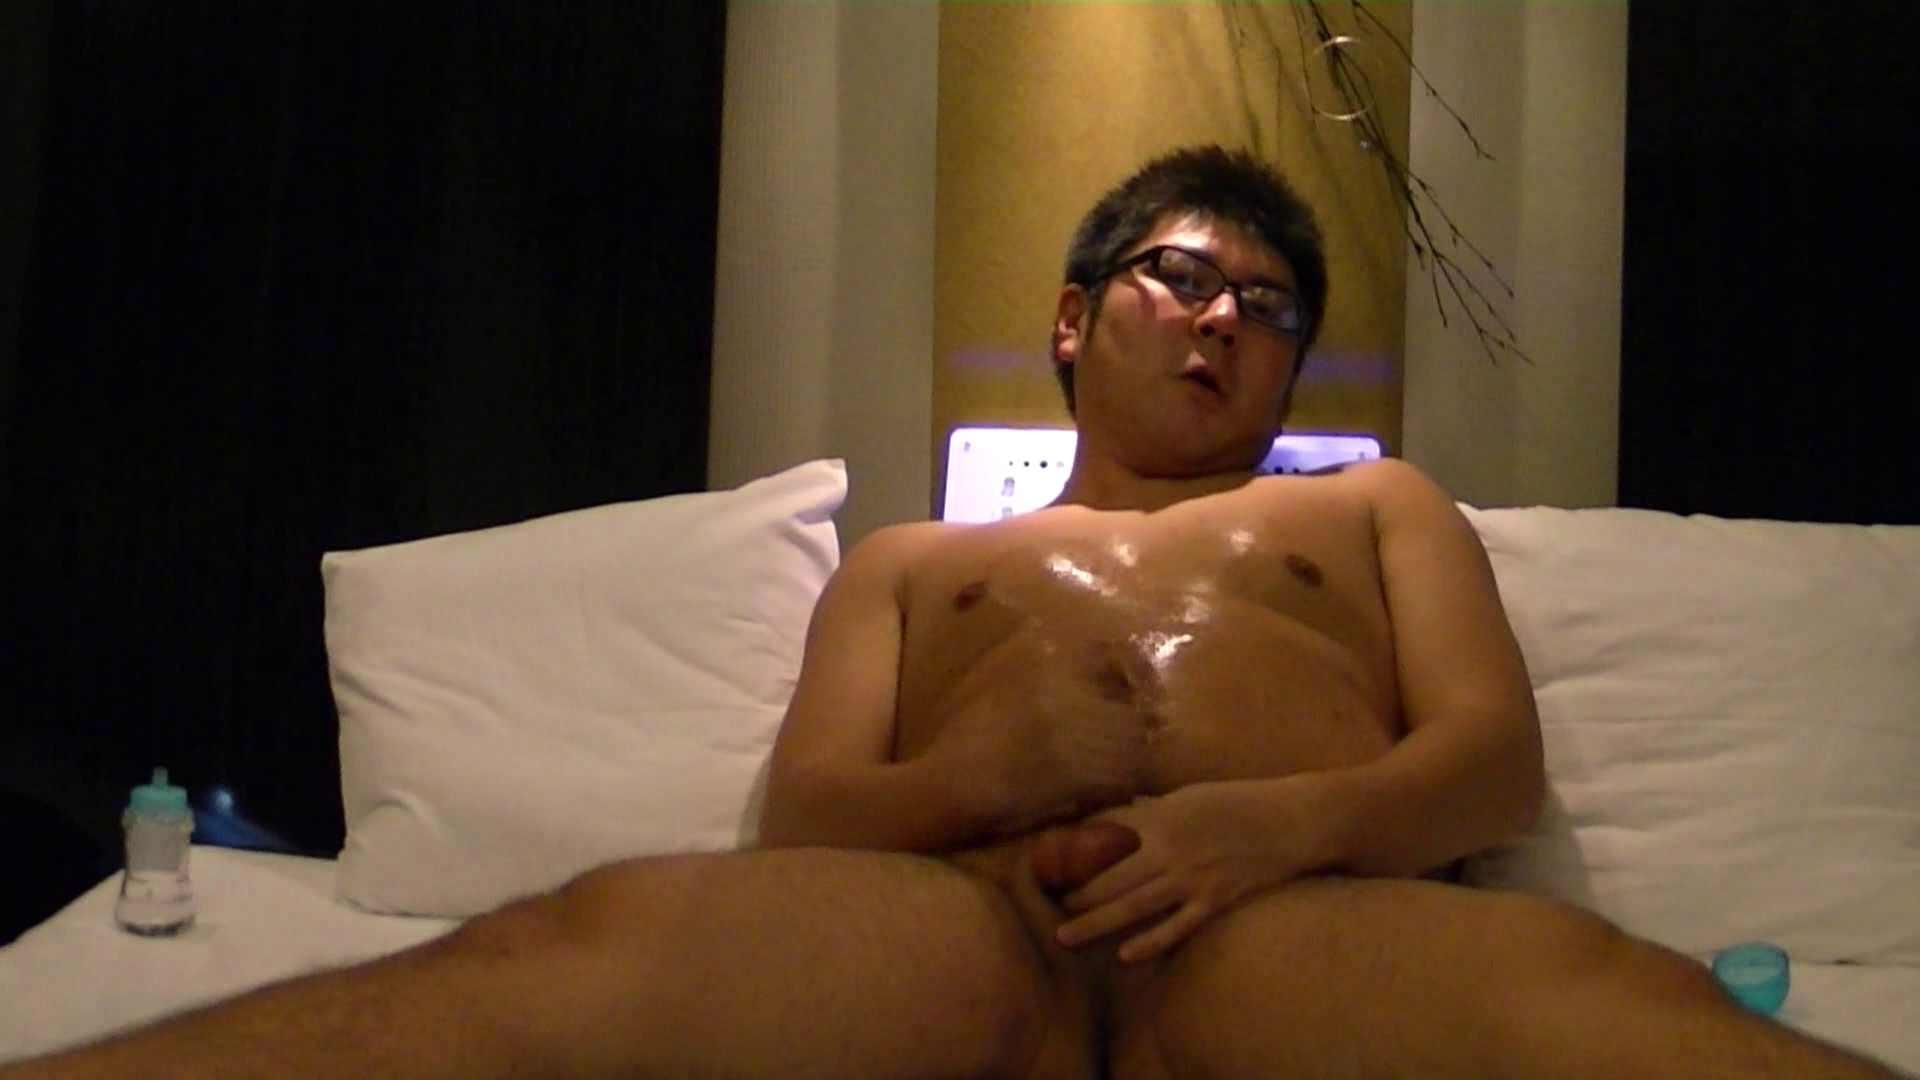 Mr.オナックスさん投稿!HD 貴方のオナニー三万円で撮影させてください。VOL.03 後編 完全無修正版  106枚 30